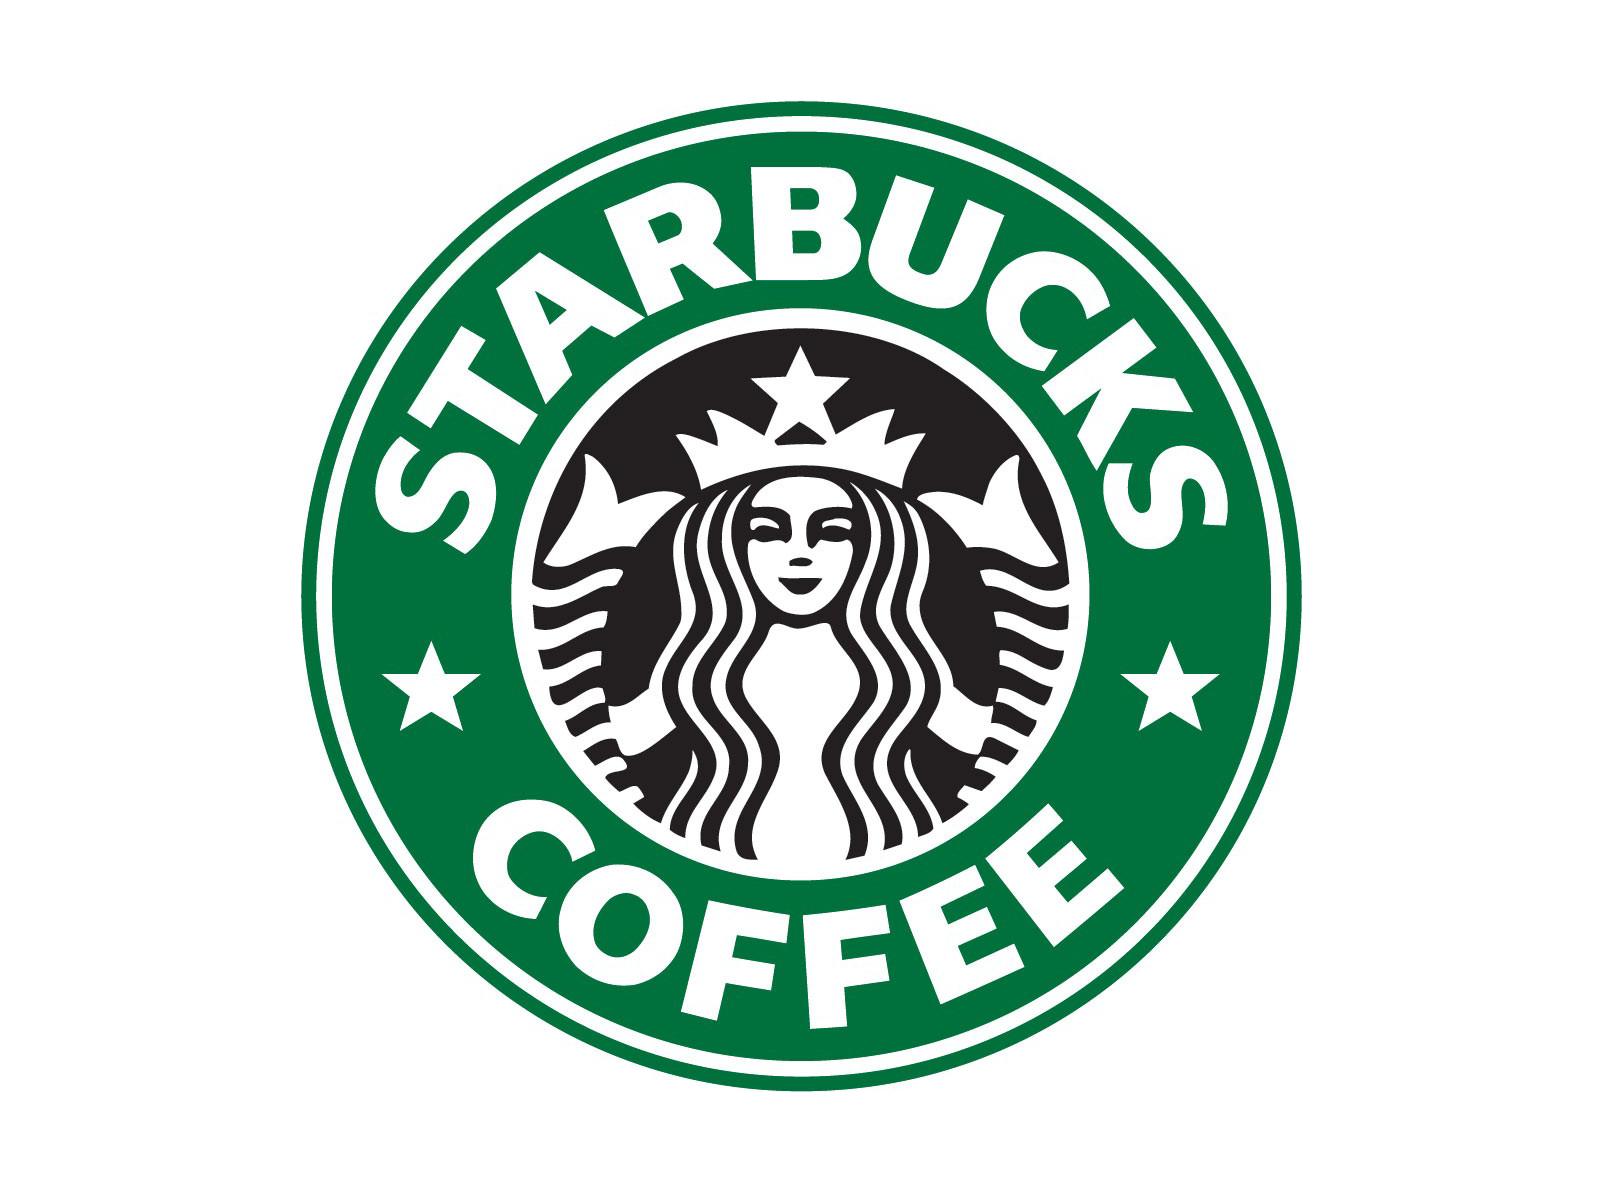 Starbucks clipart logo starbucks. Tin cup golf tournament